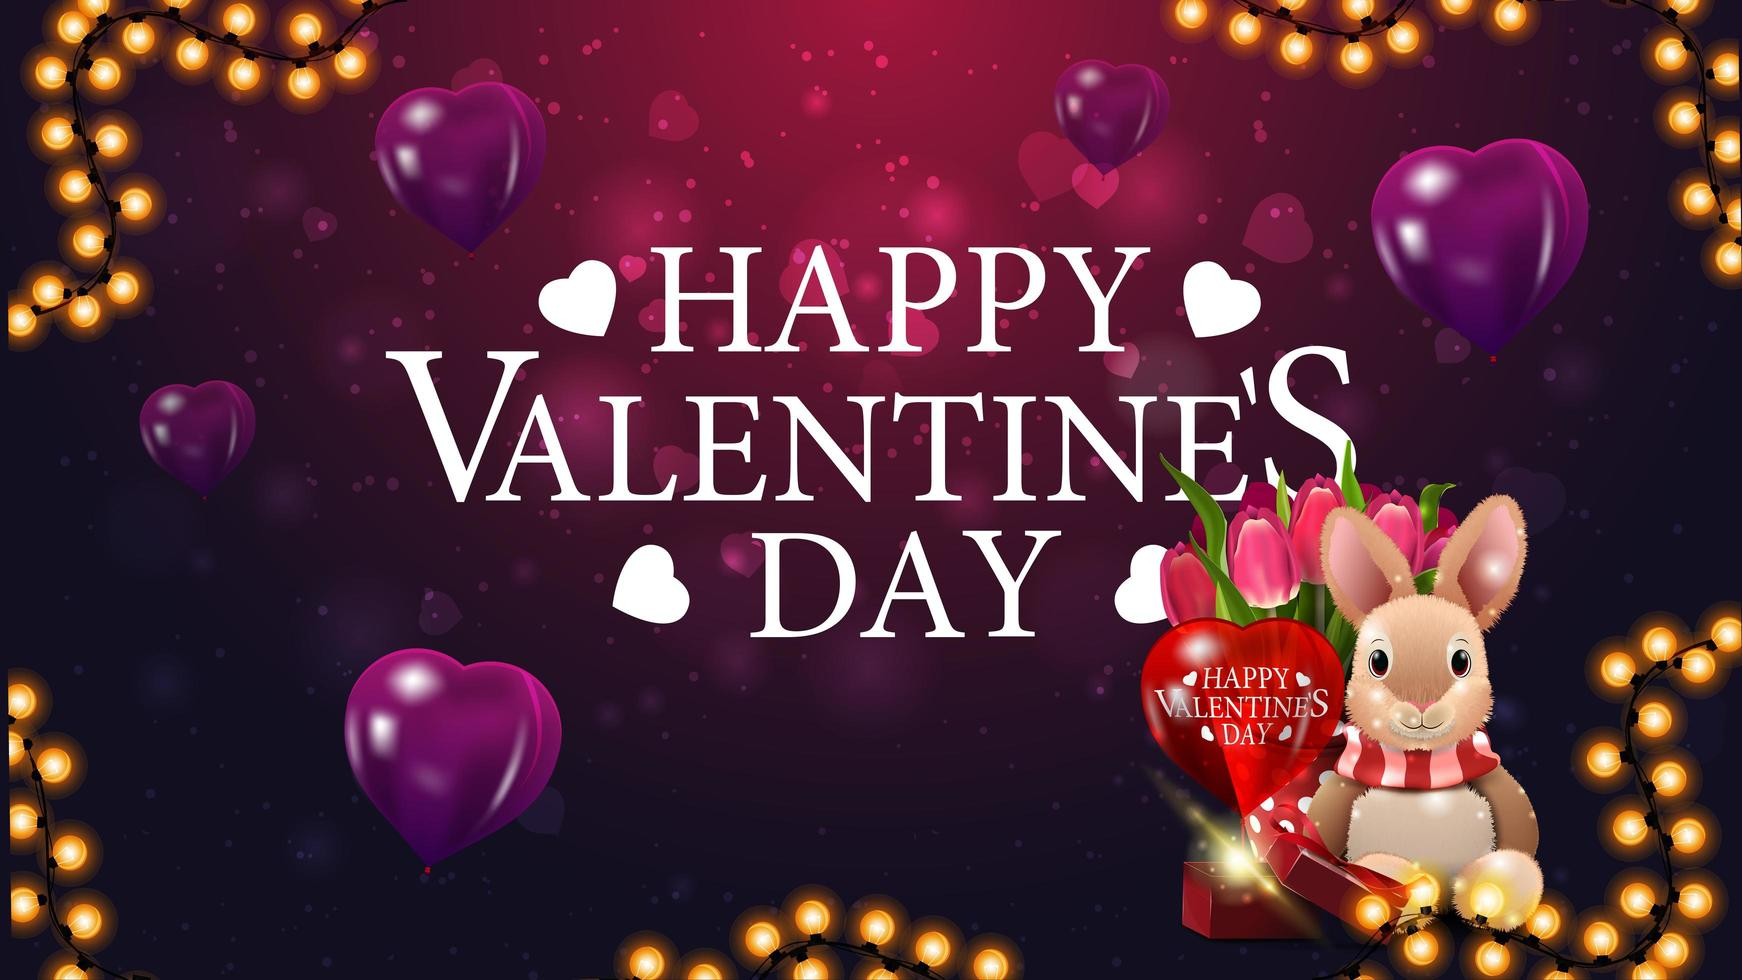 Happy Valentine's day purple postcard with purple heart vector